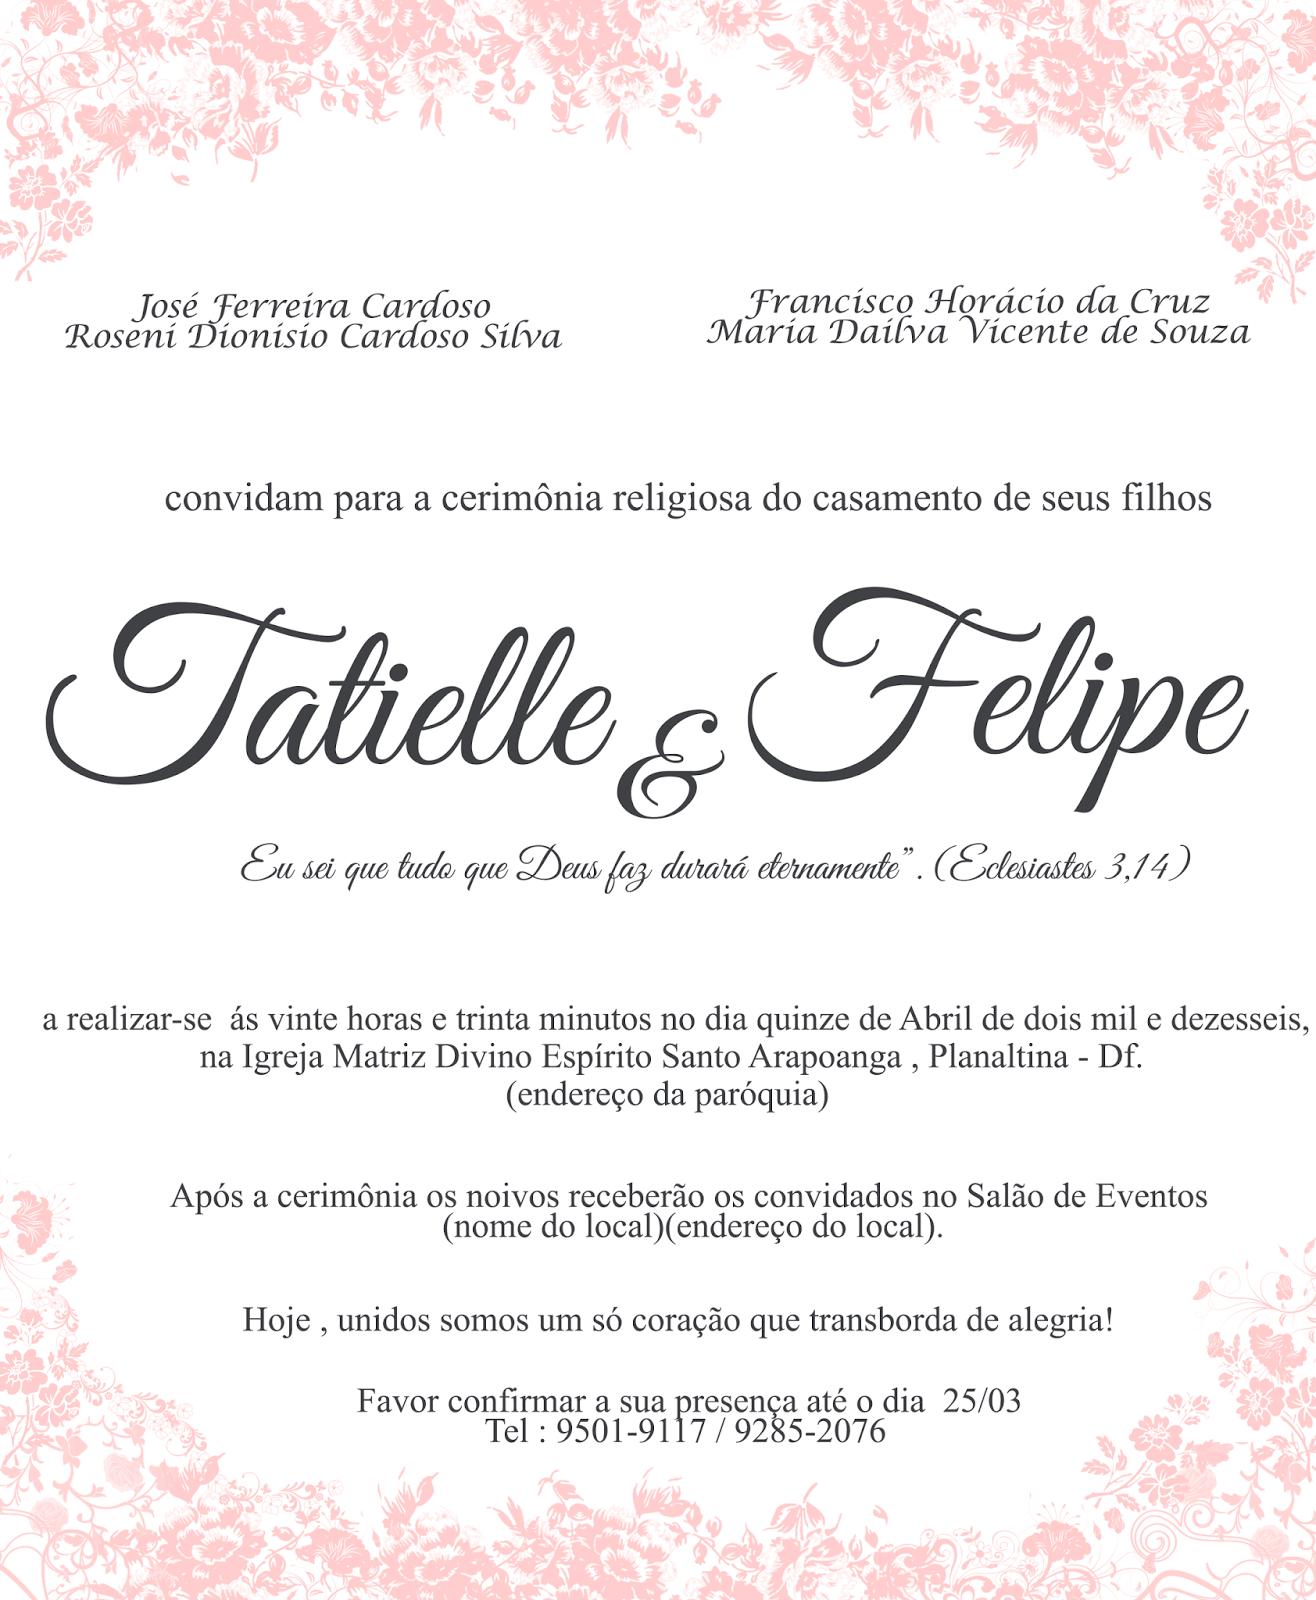 40 Frases Românticas Para Convites De Casamento Total Print